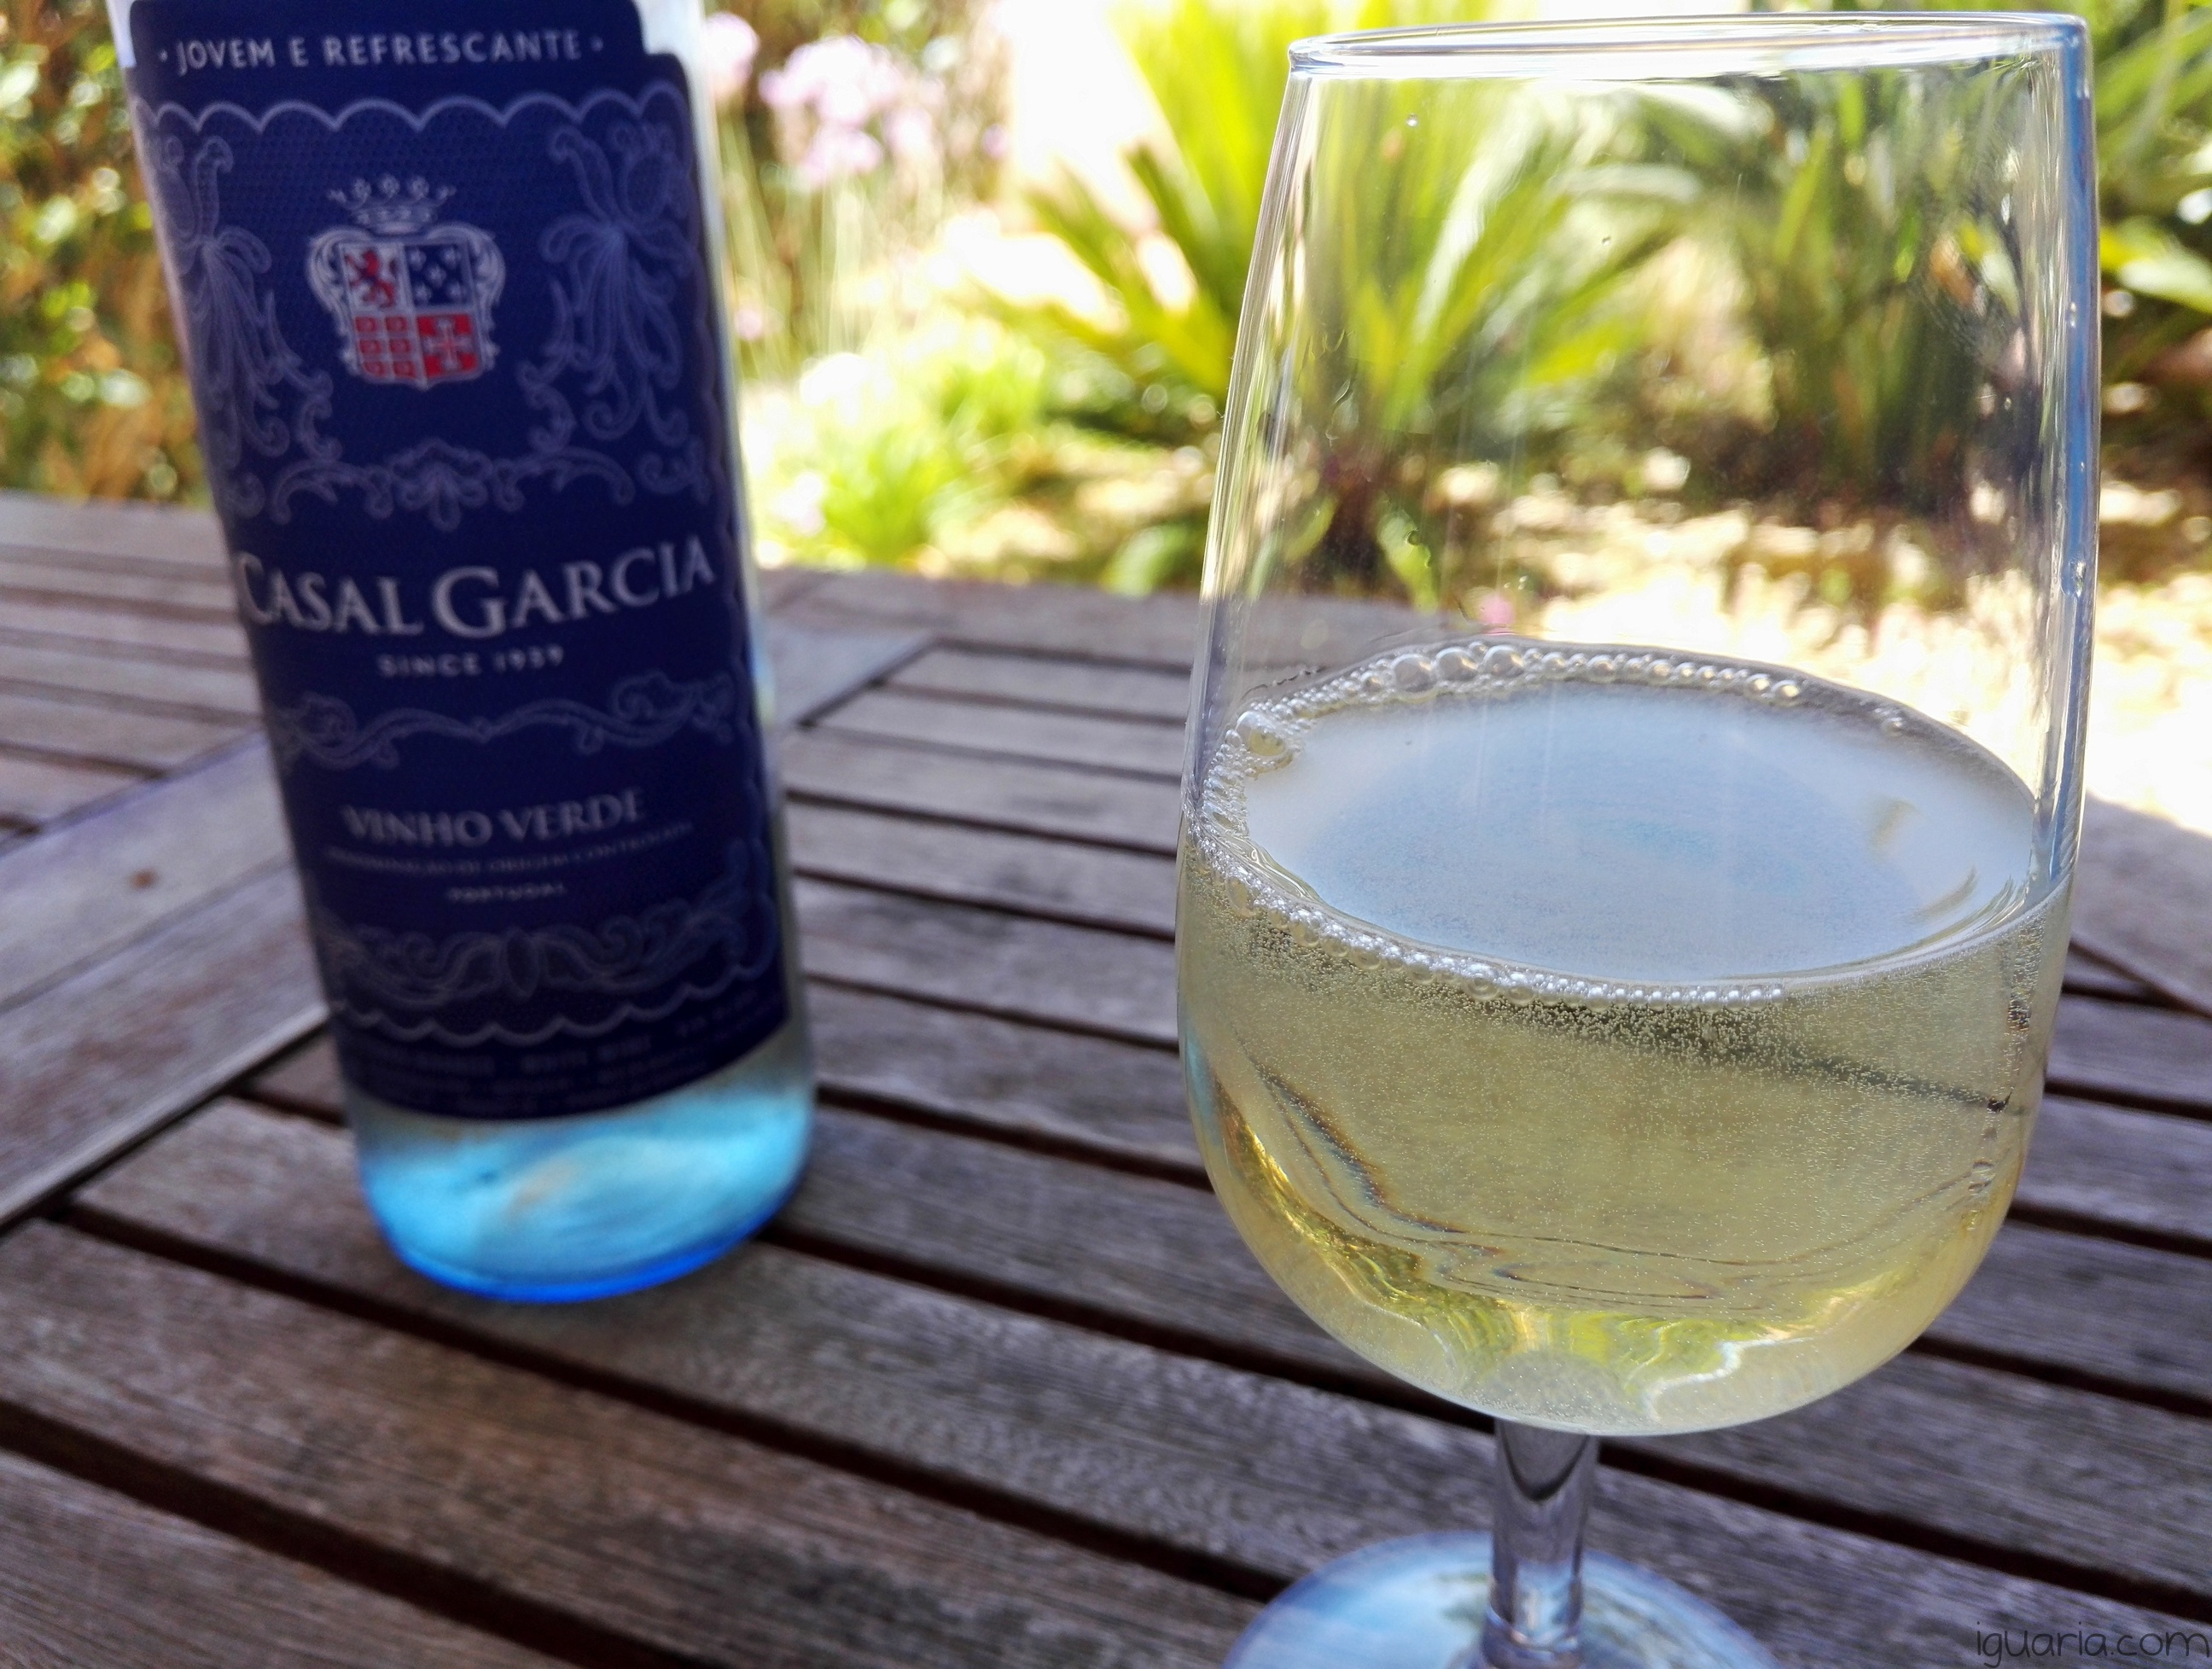 Iguaria_Vinho-Casal-Garcia-no-Copo